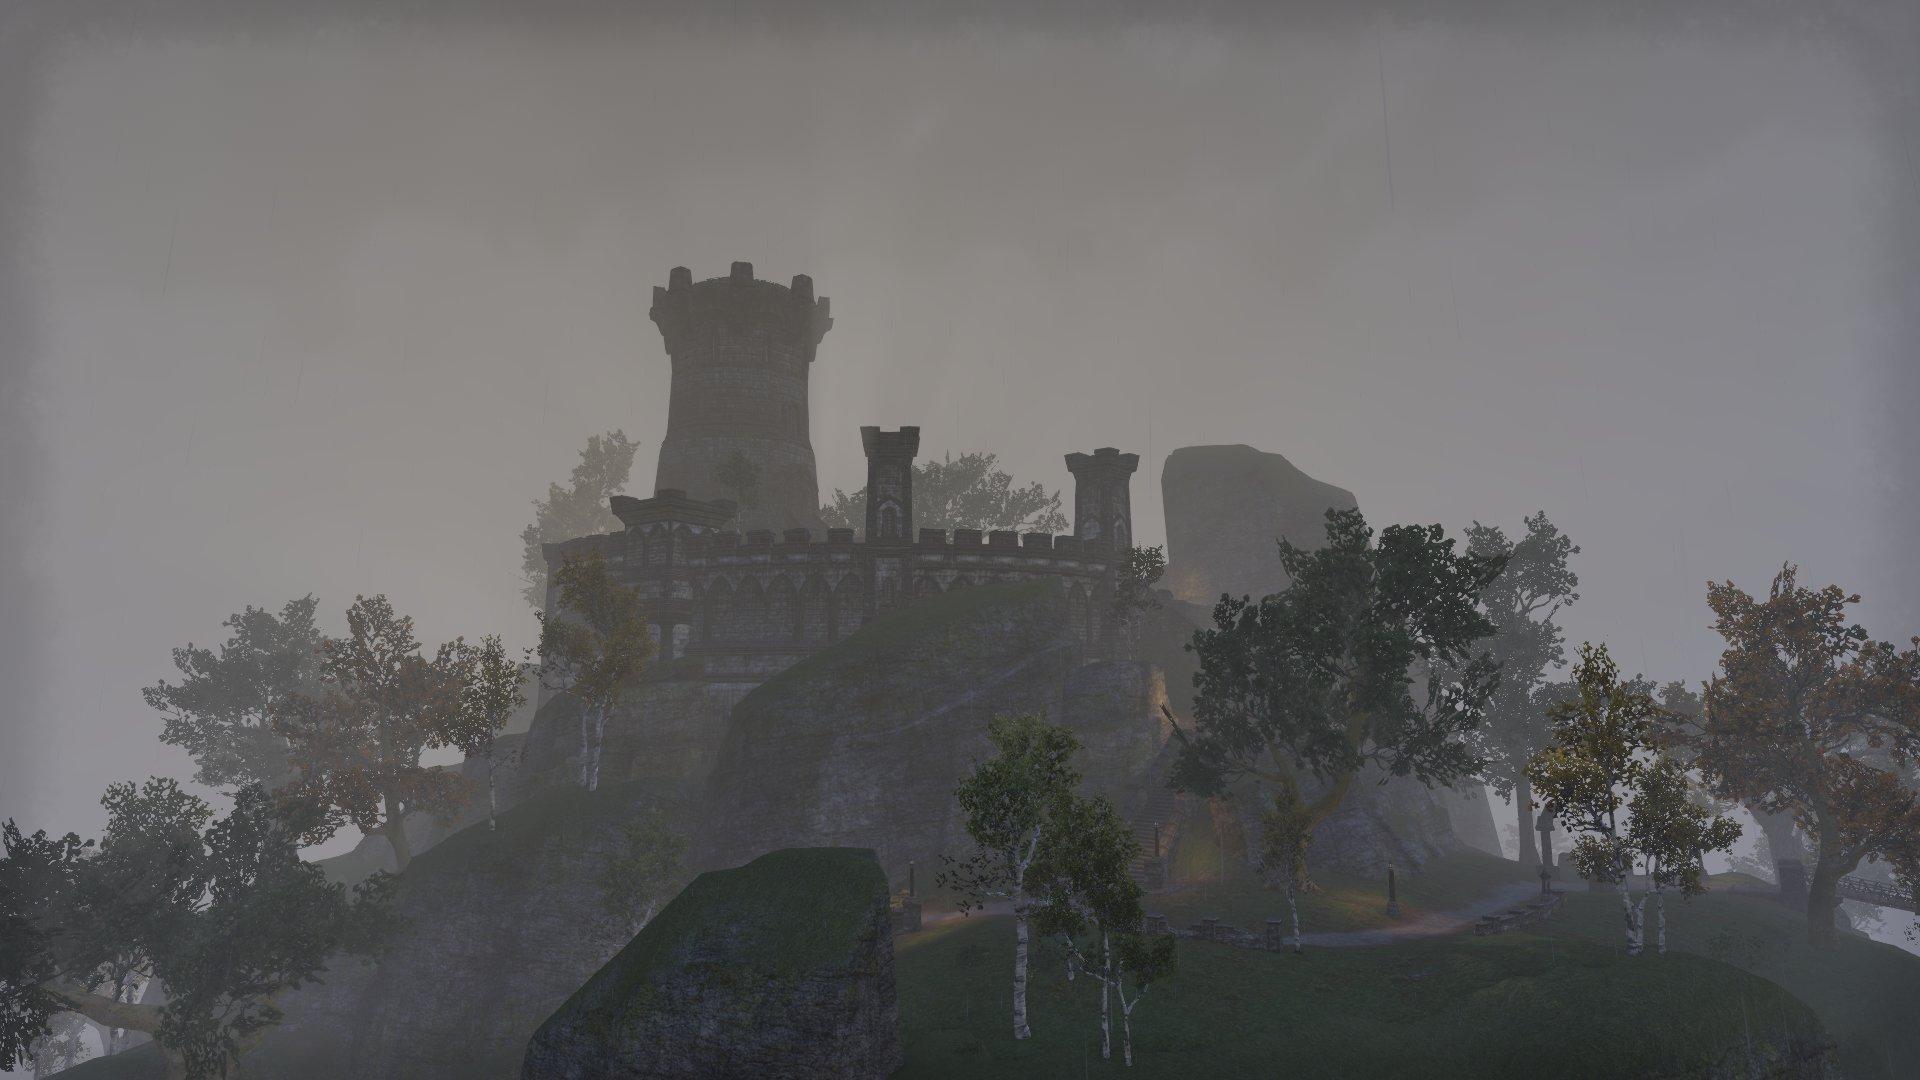 Farwatch Tower